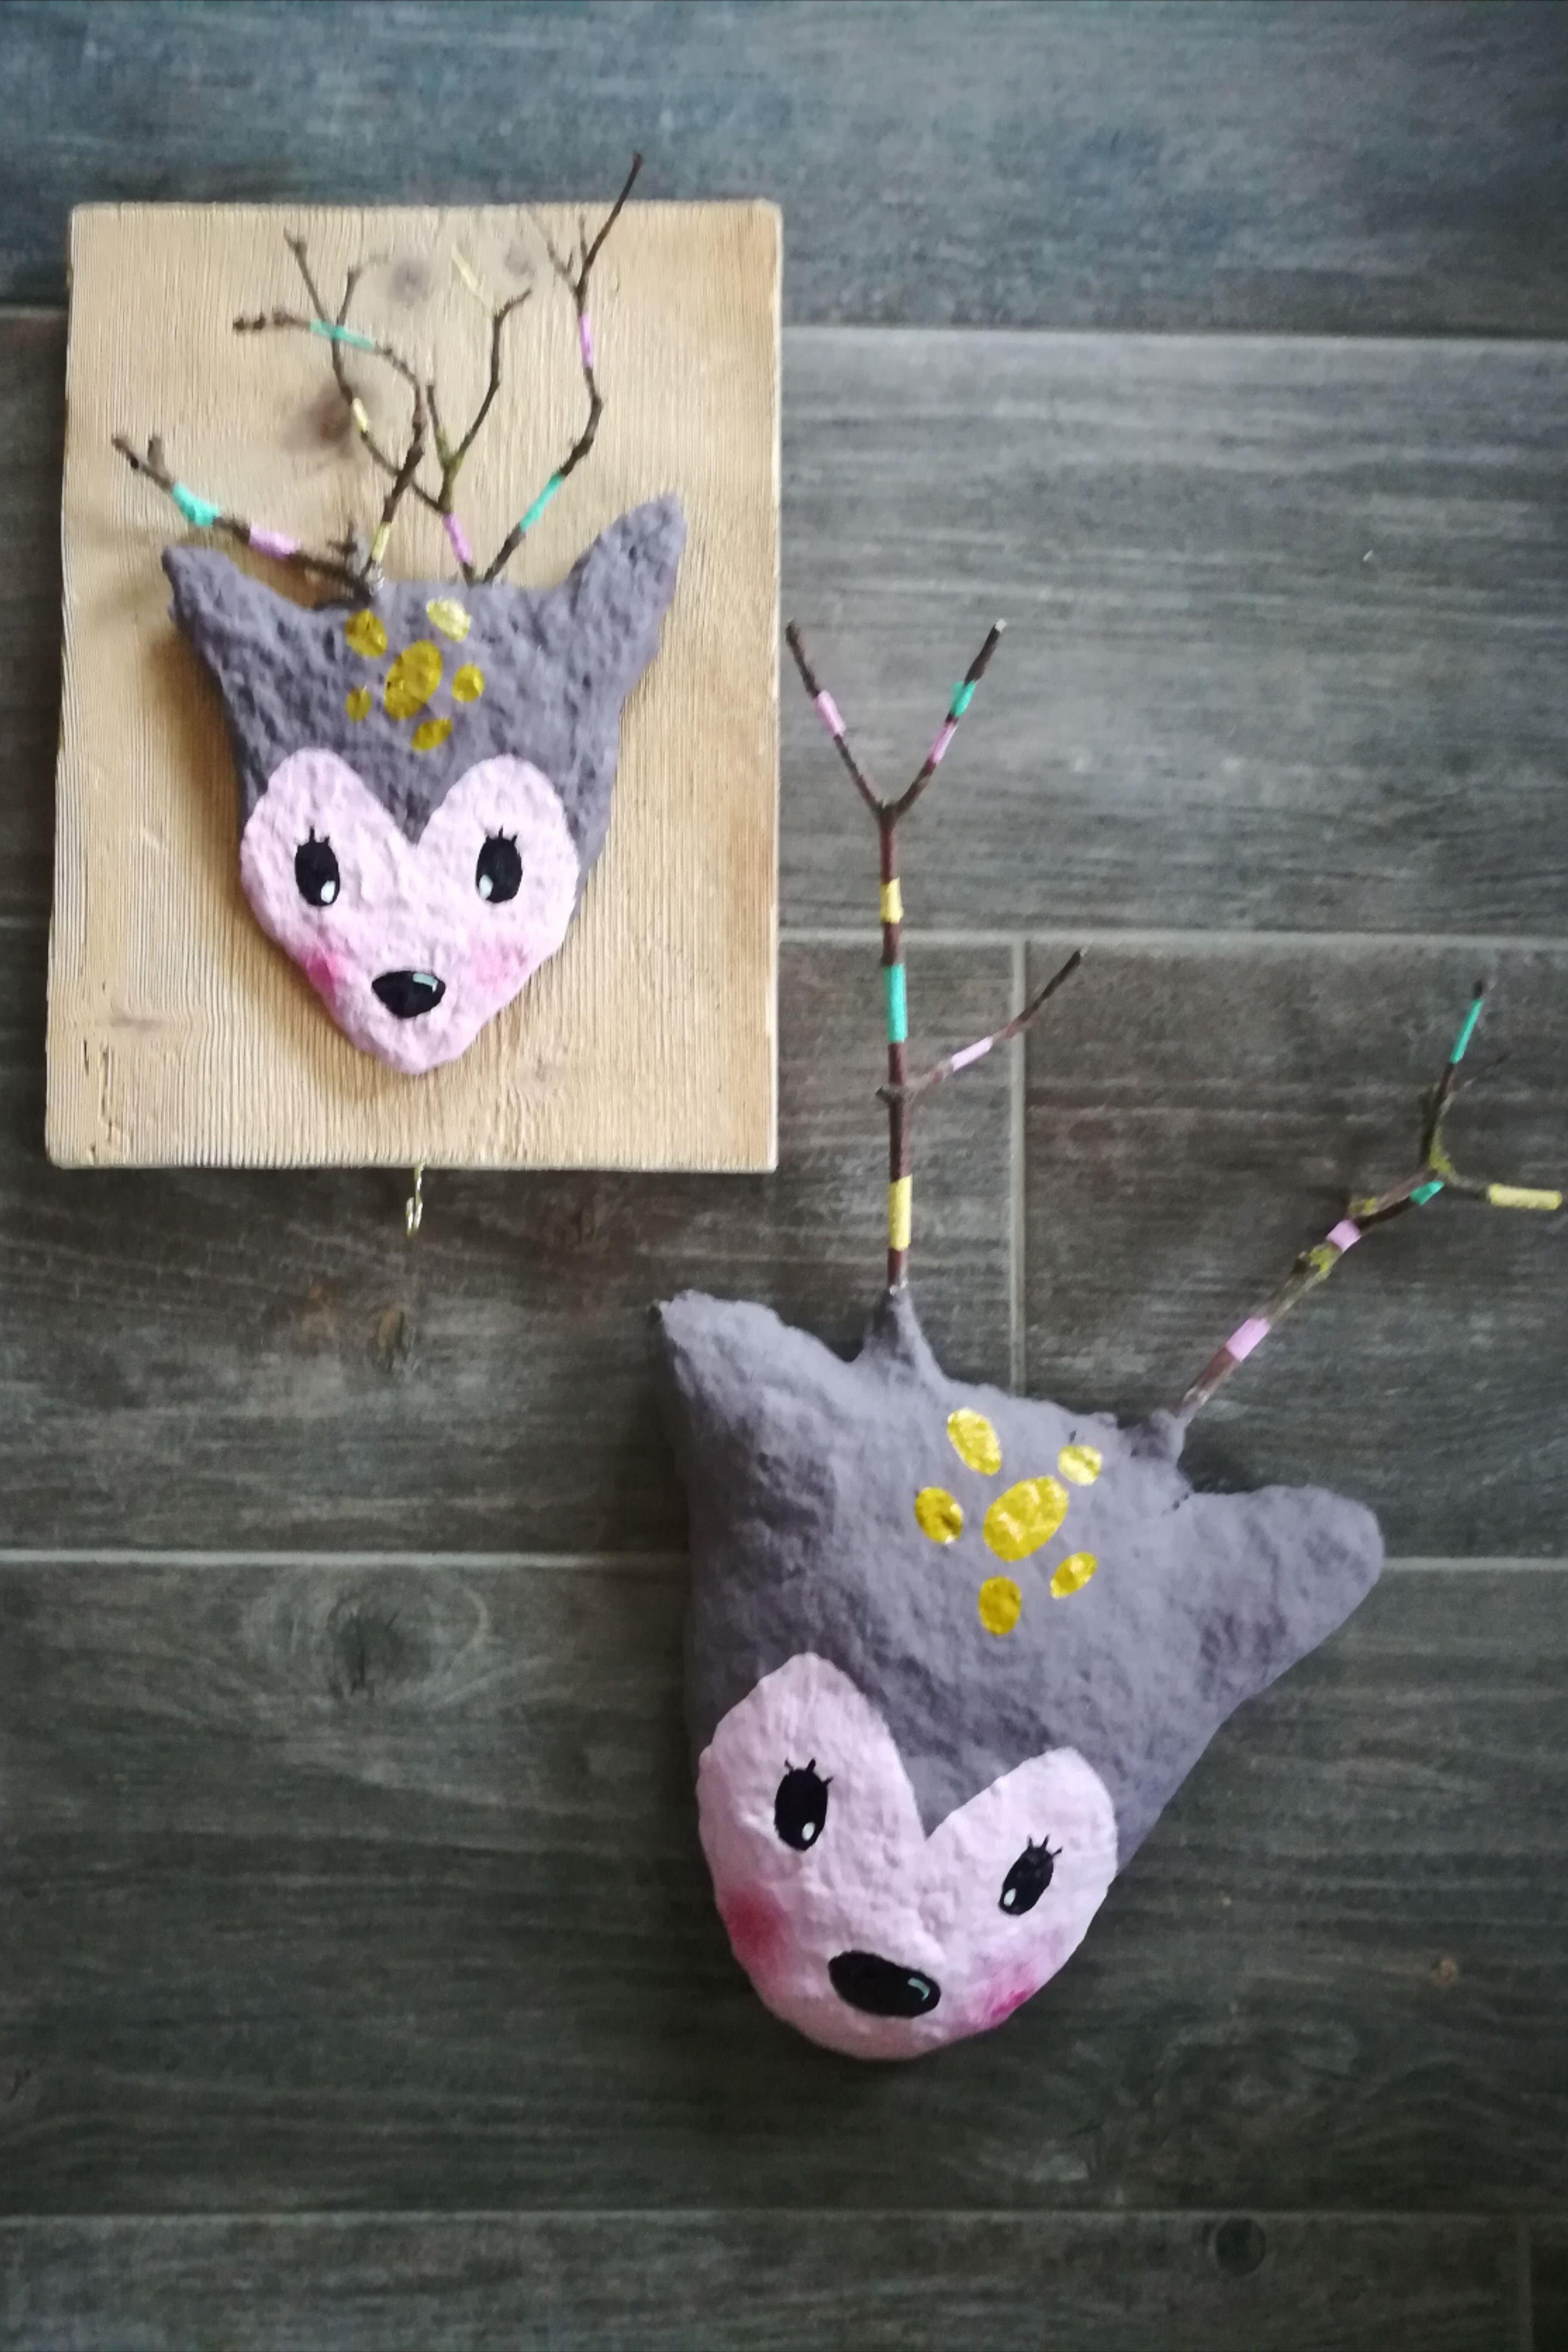 pappmache figur tierkopf fur kinderzimmer deko oder als geschenk tierkopfe baby geschenke kinder geschnitzte wanddeko plüschtier trophäe